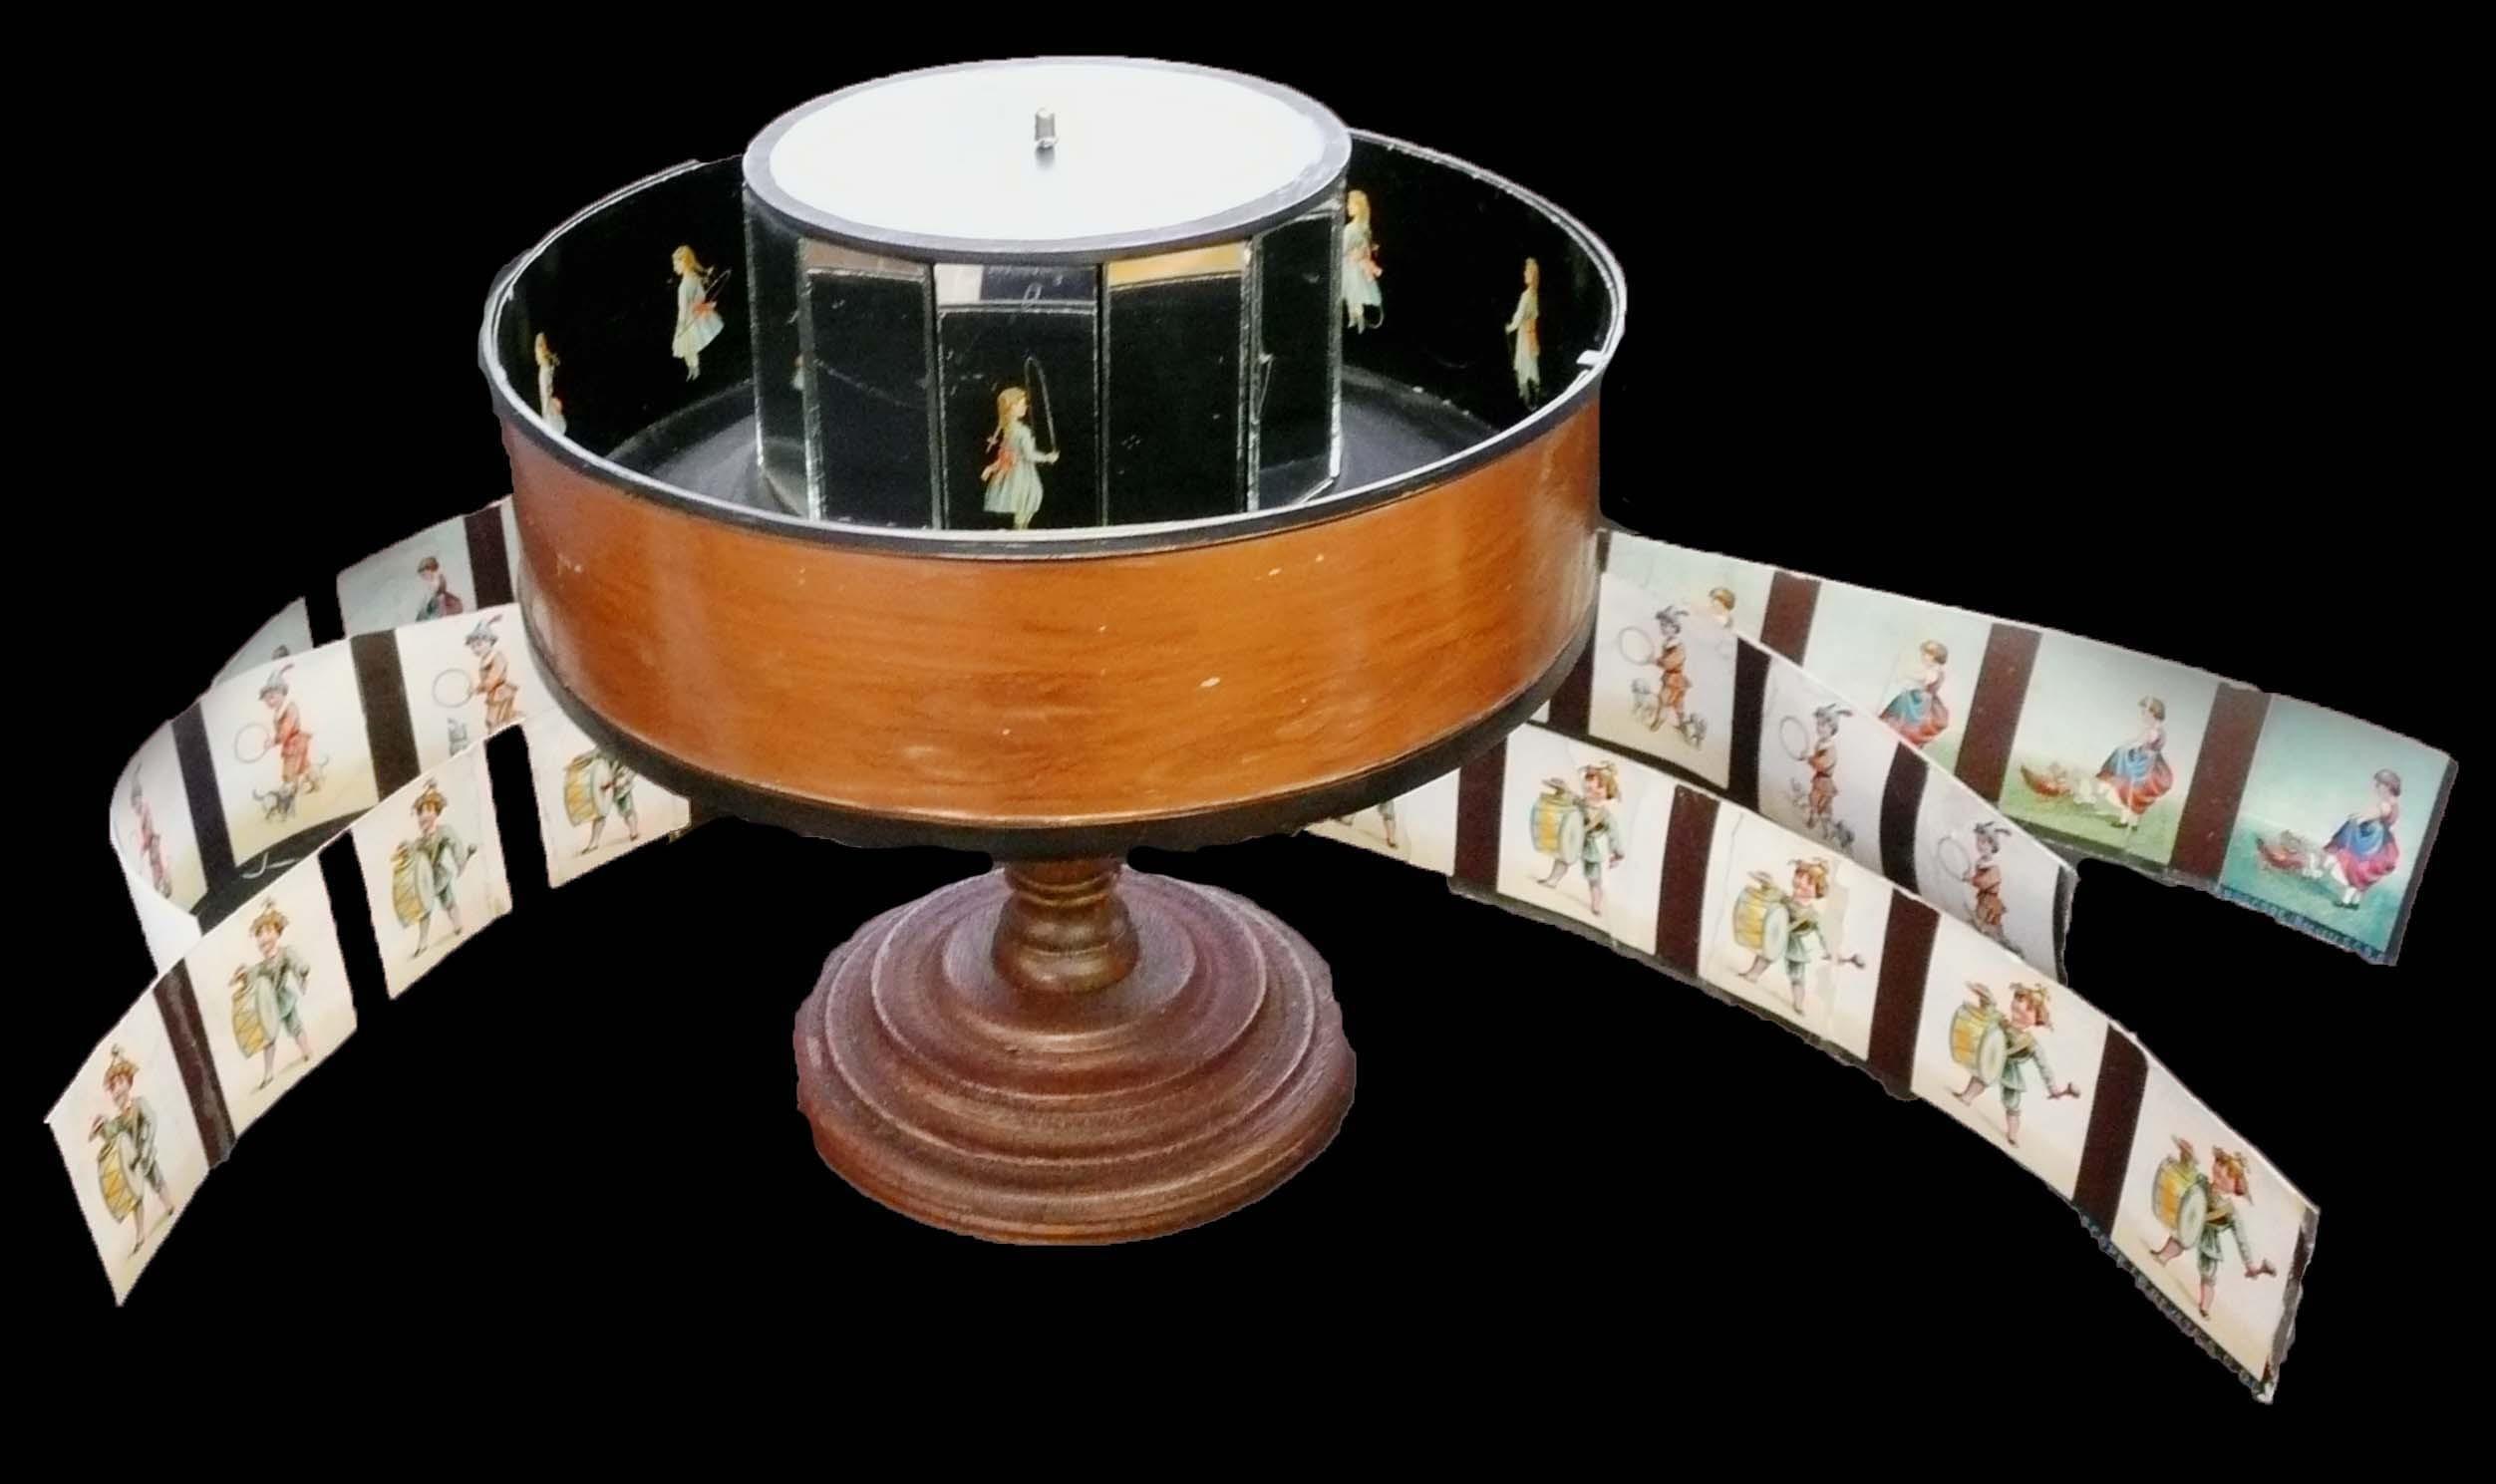 Praxinoscope avec bandes - fin 19ème siècle